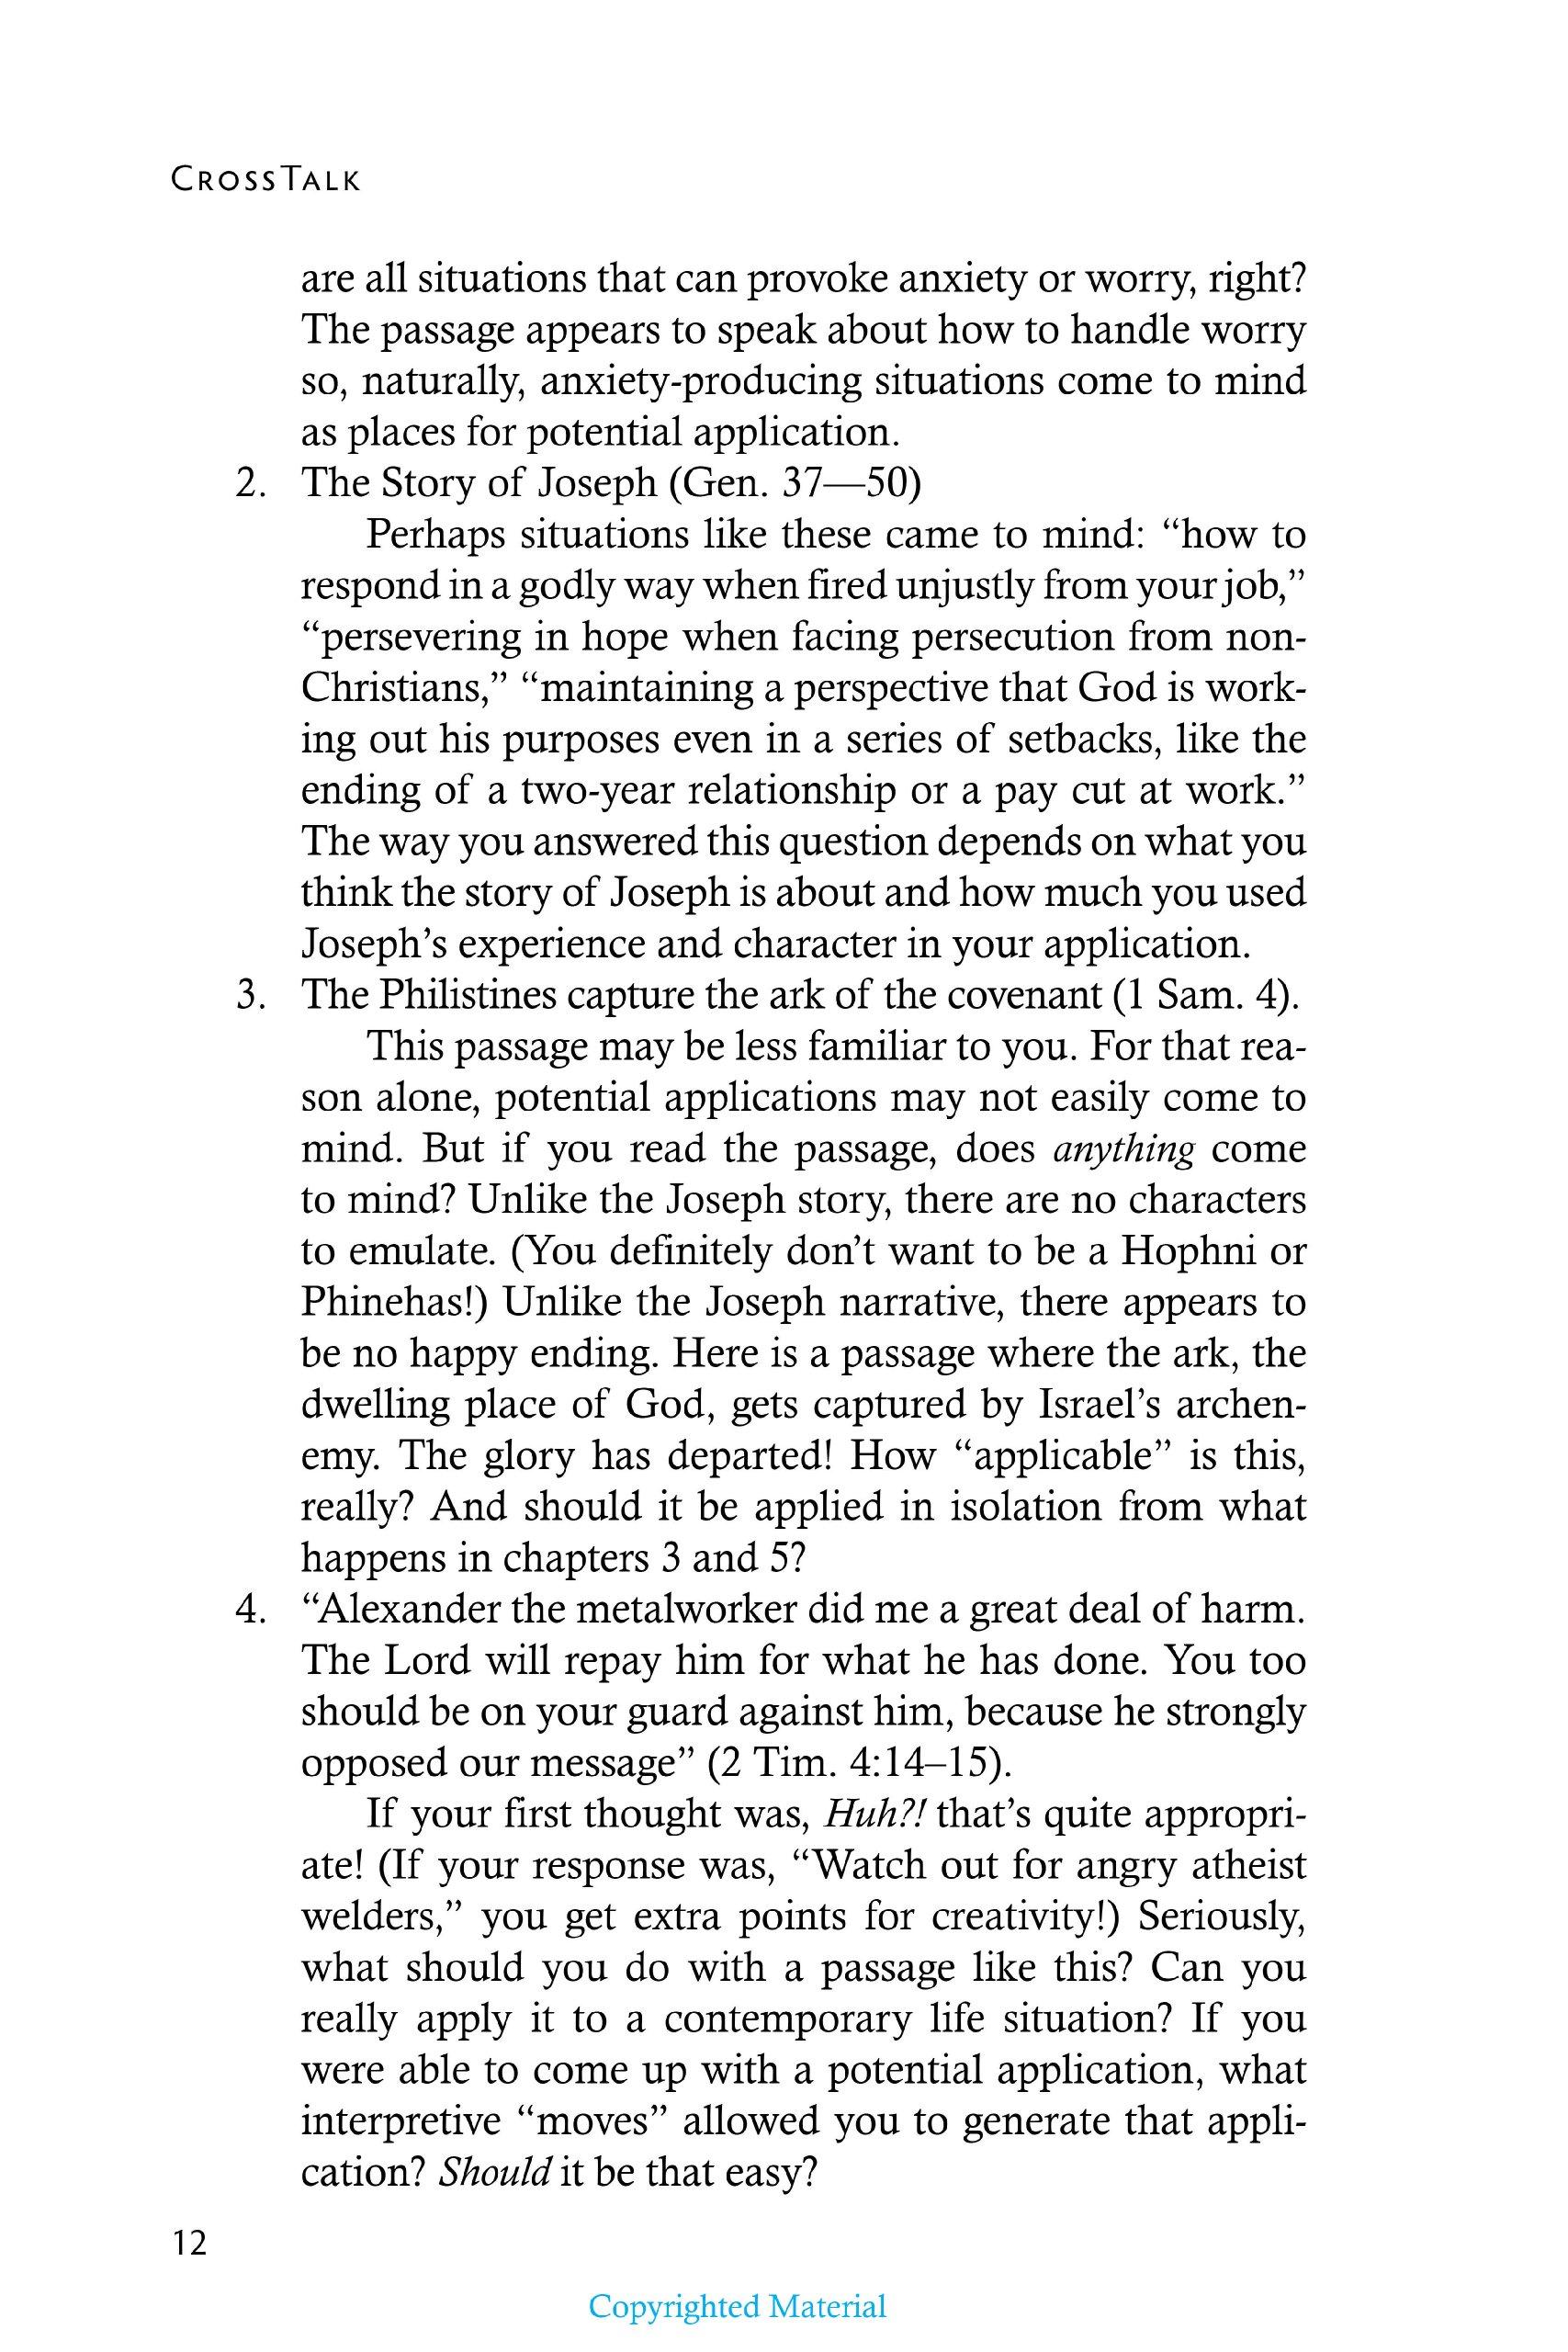 CROSSTALK WHERE LIFE AND SCRIPTURE MEET: Amazon.co.uk: EMLET